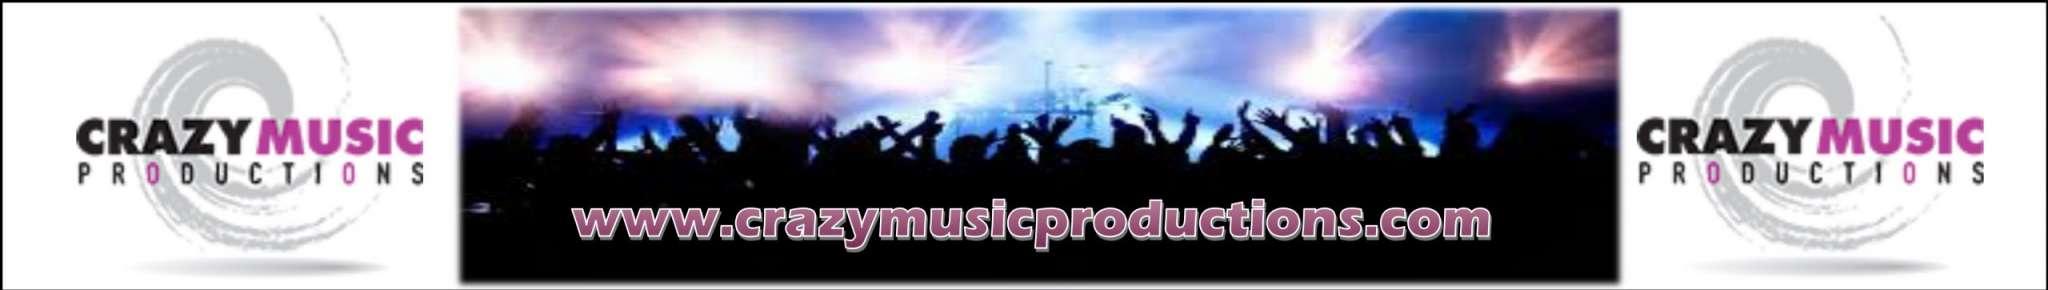 crazy music